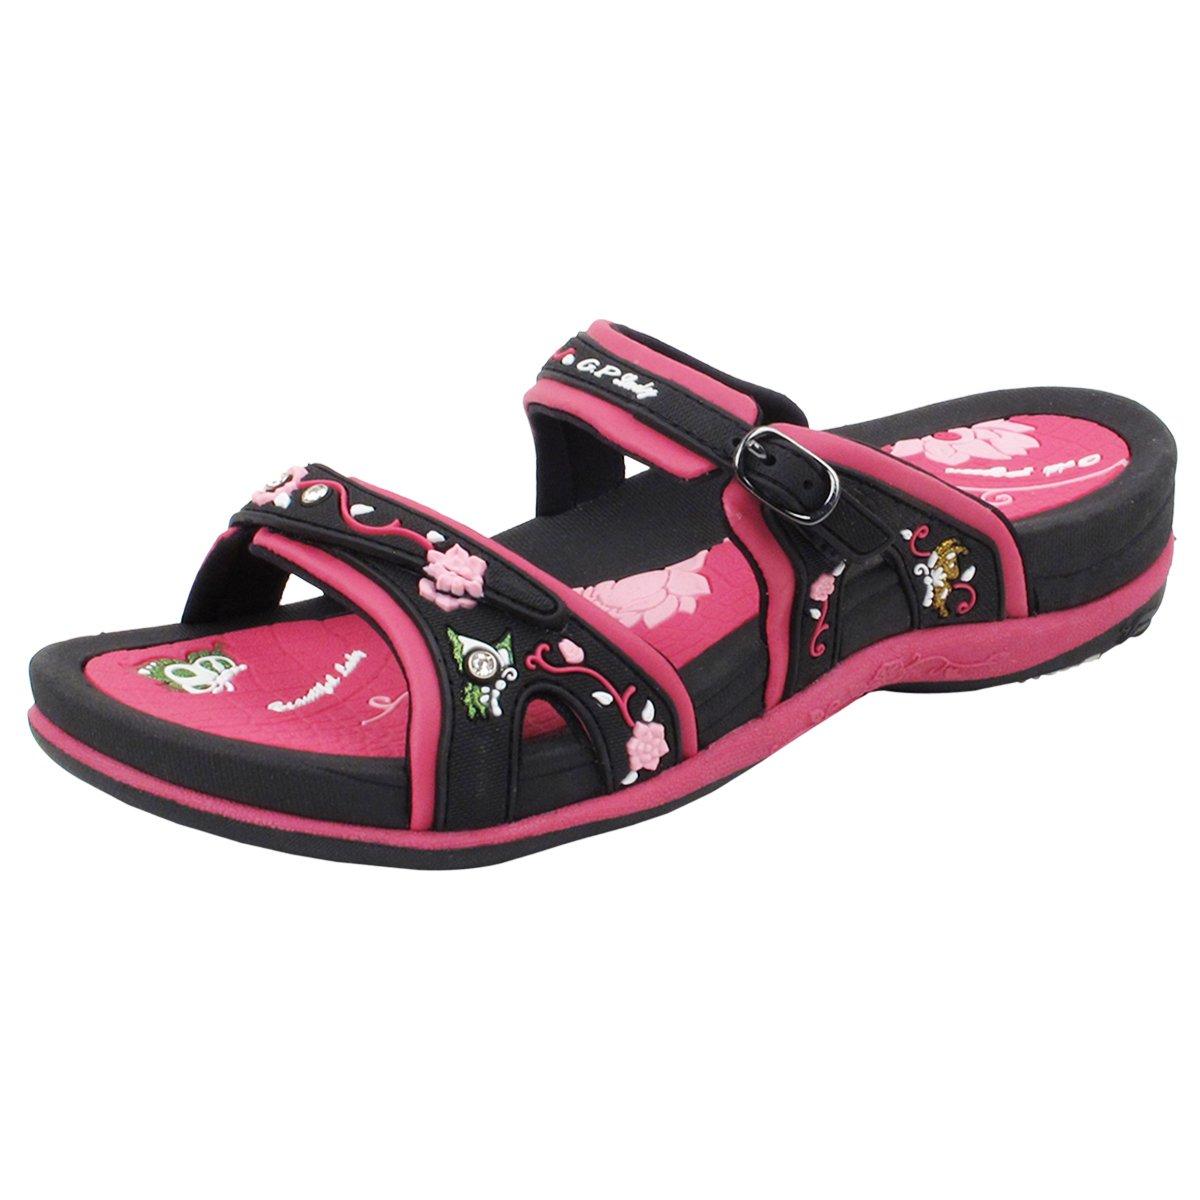 Signature Women Sandals, Comfort Egronomic Sole, Waterproof (Size 4-9.5)